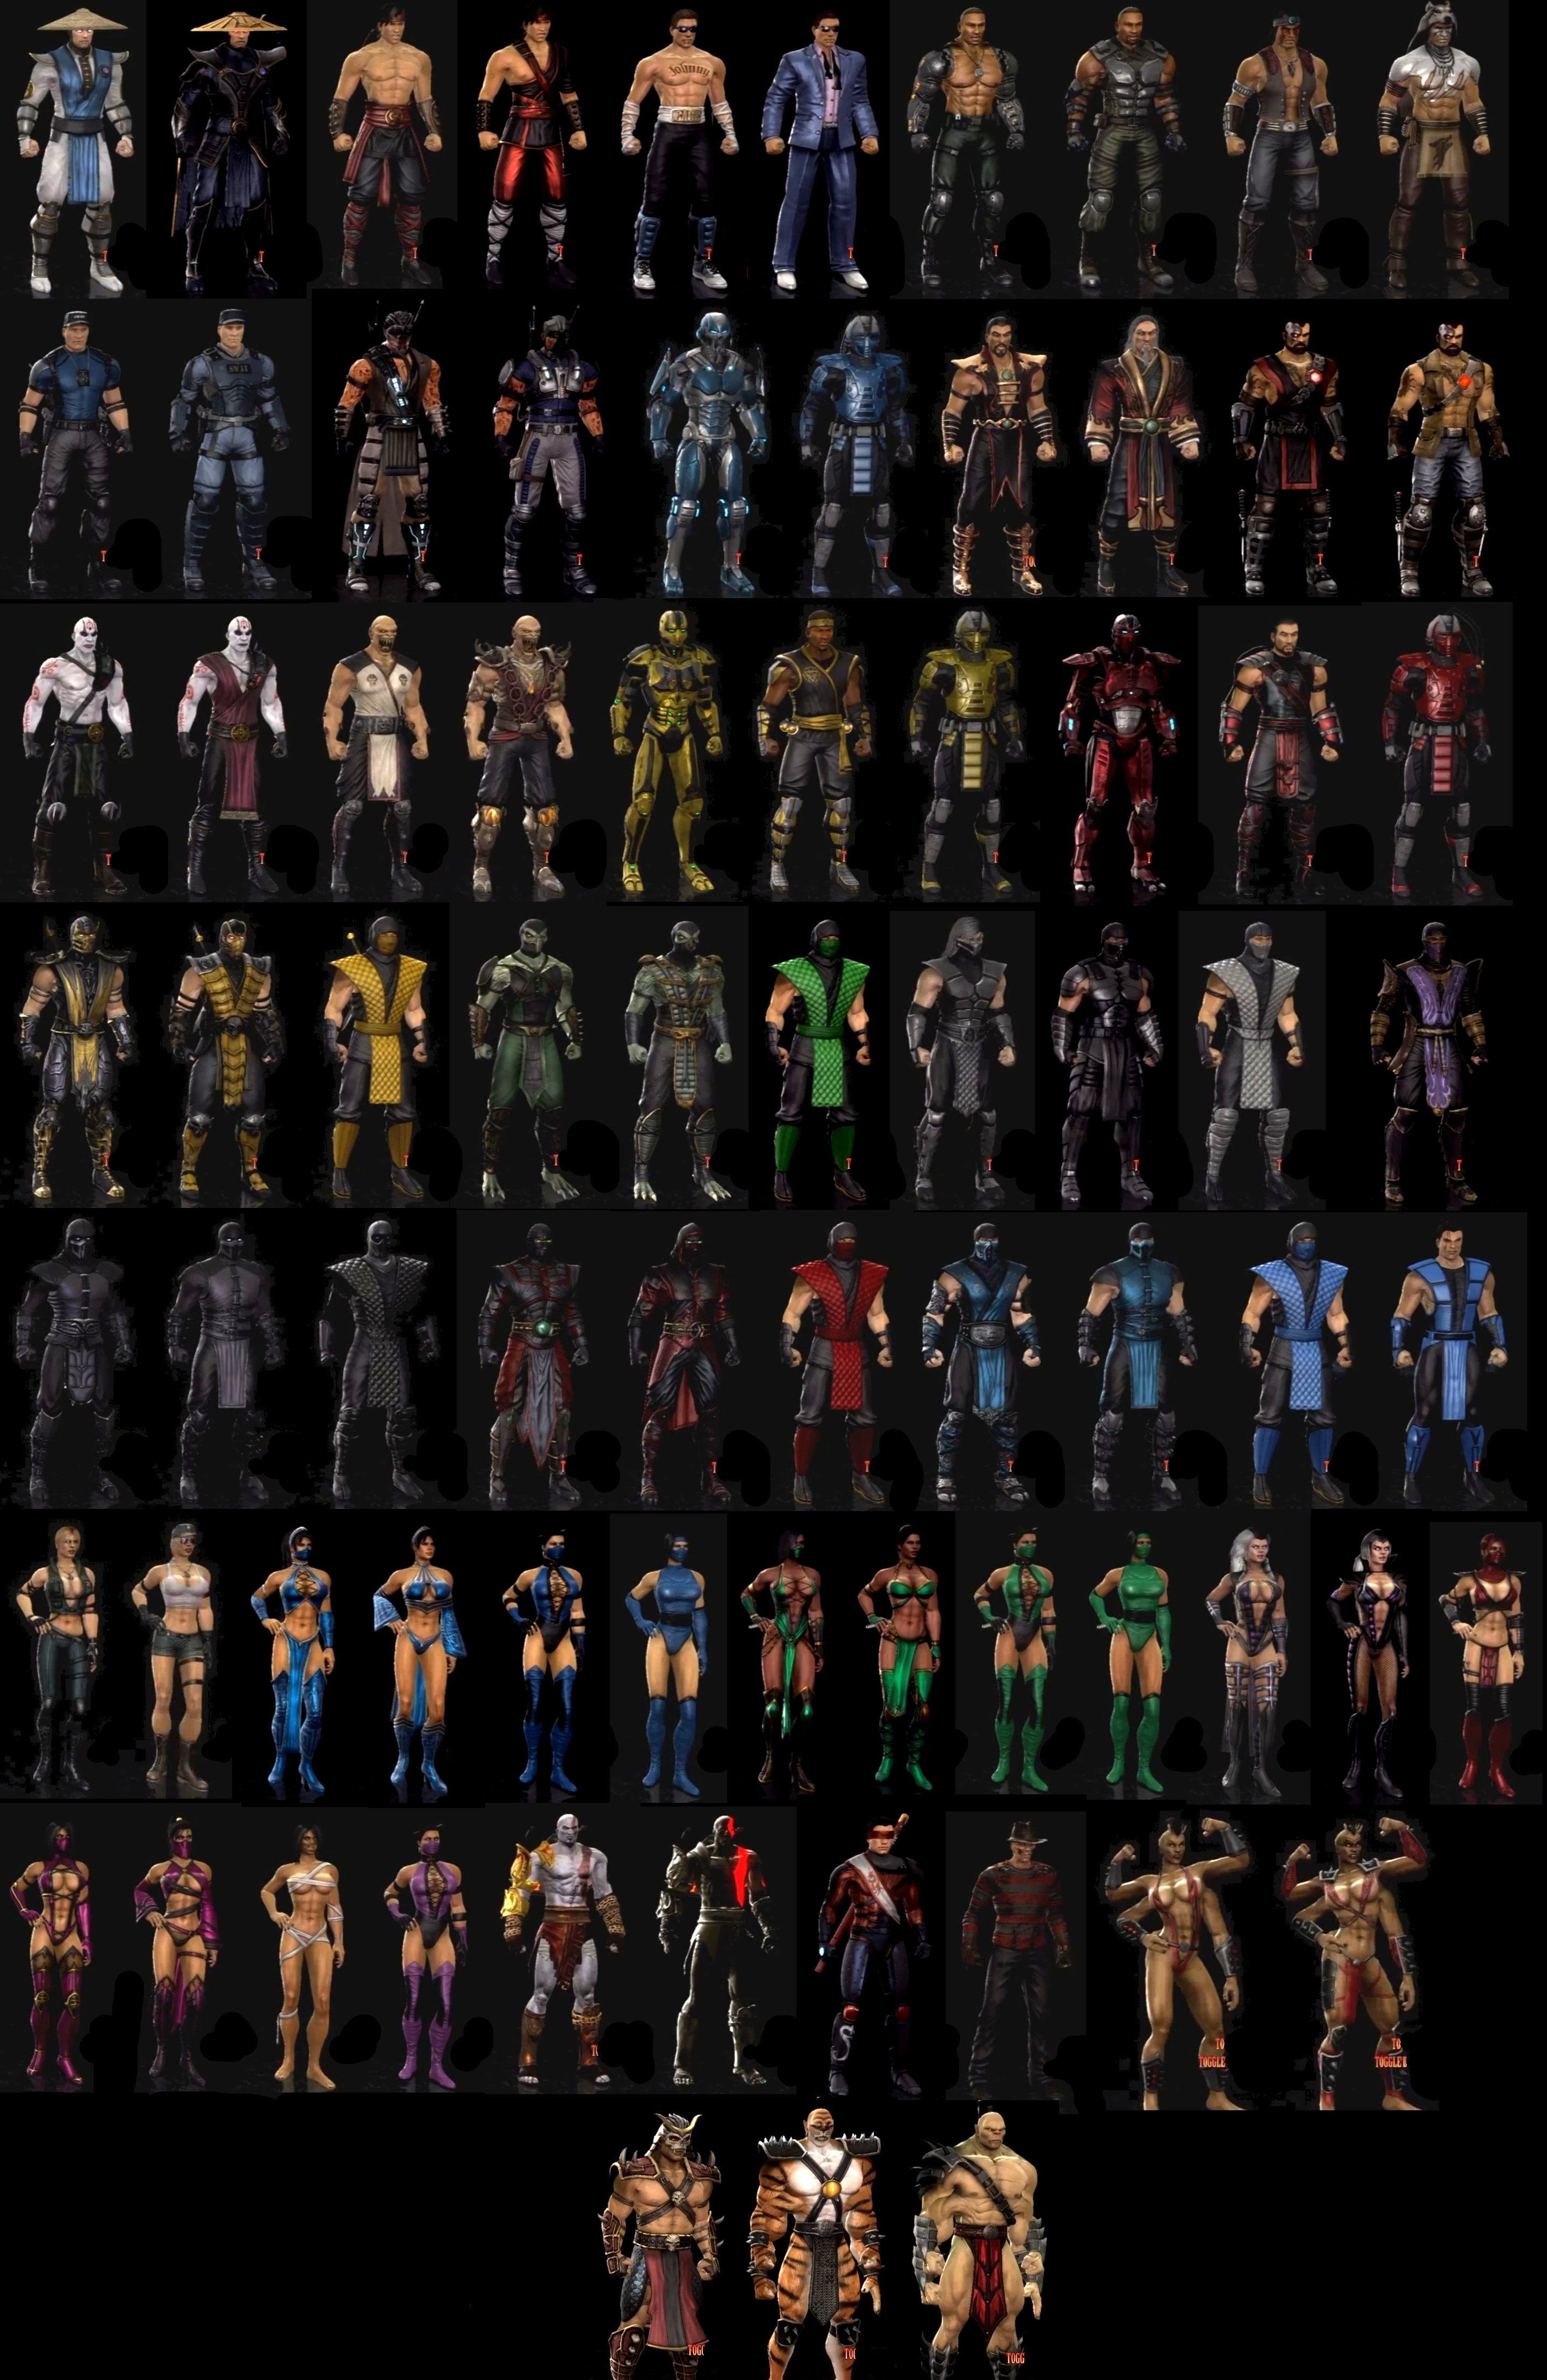 Mortal Kombat 2011 Characters by lechiffre17 on DeviantArt